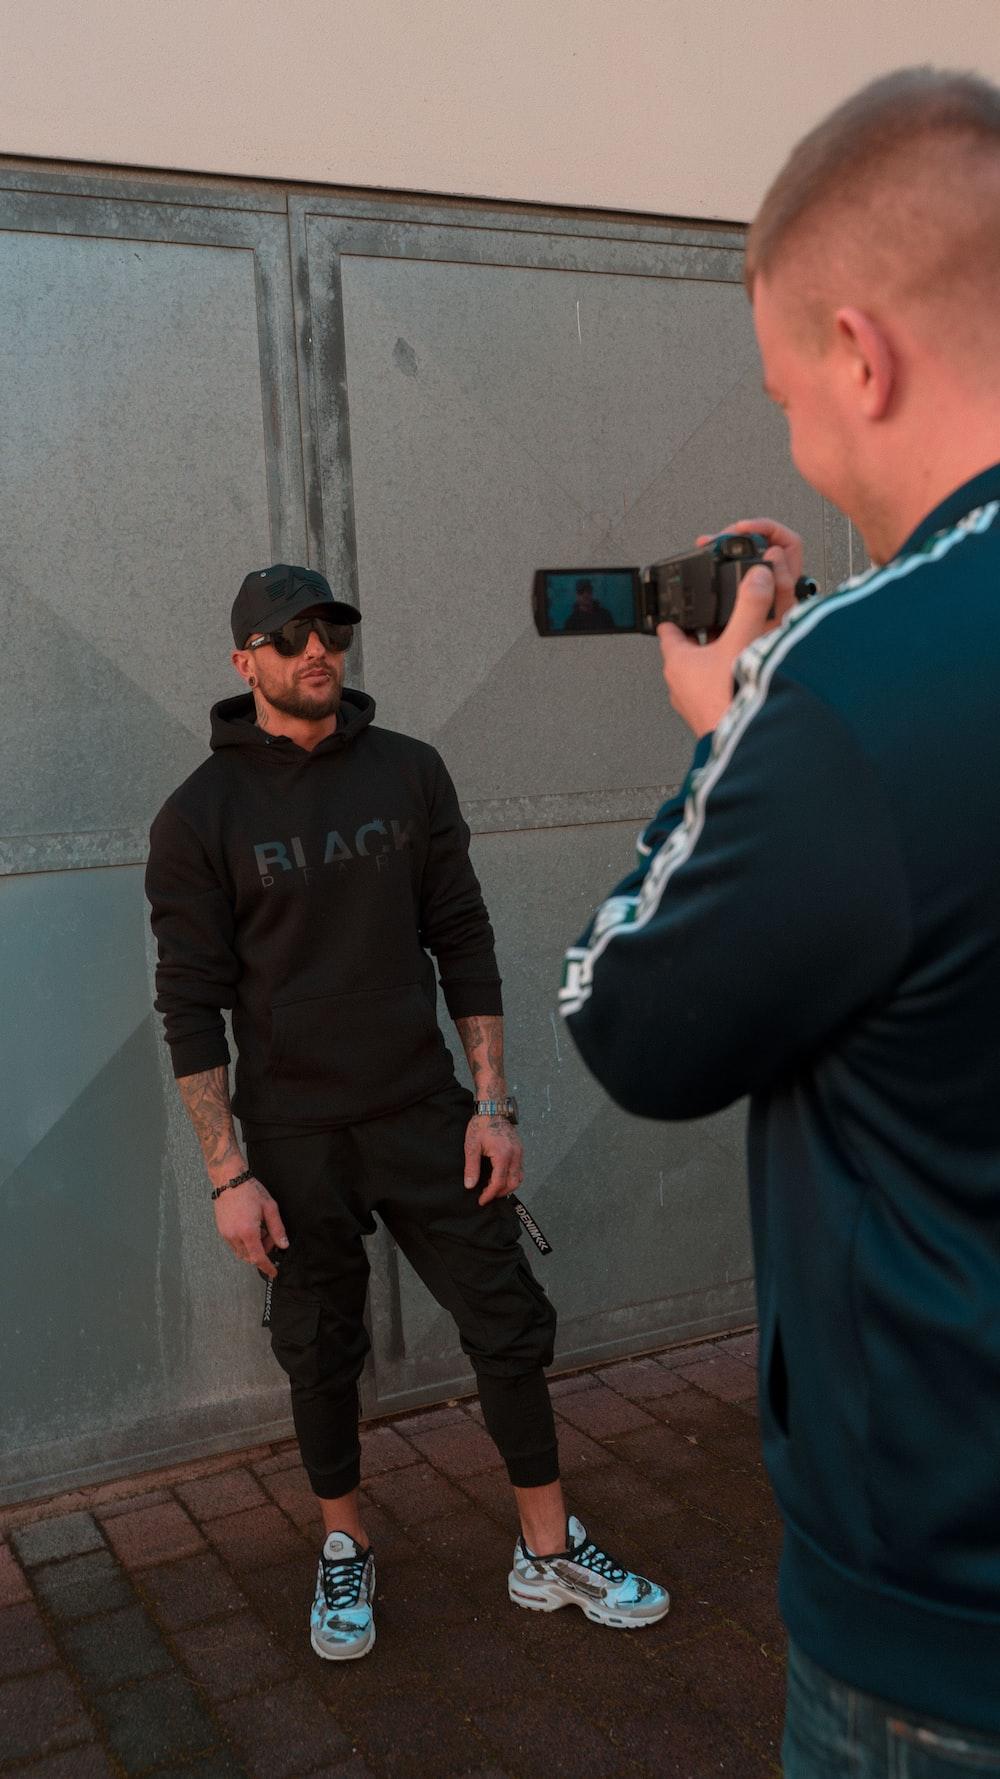 man in black sweater standing beside man in black jacket